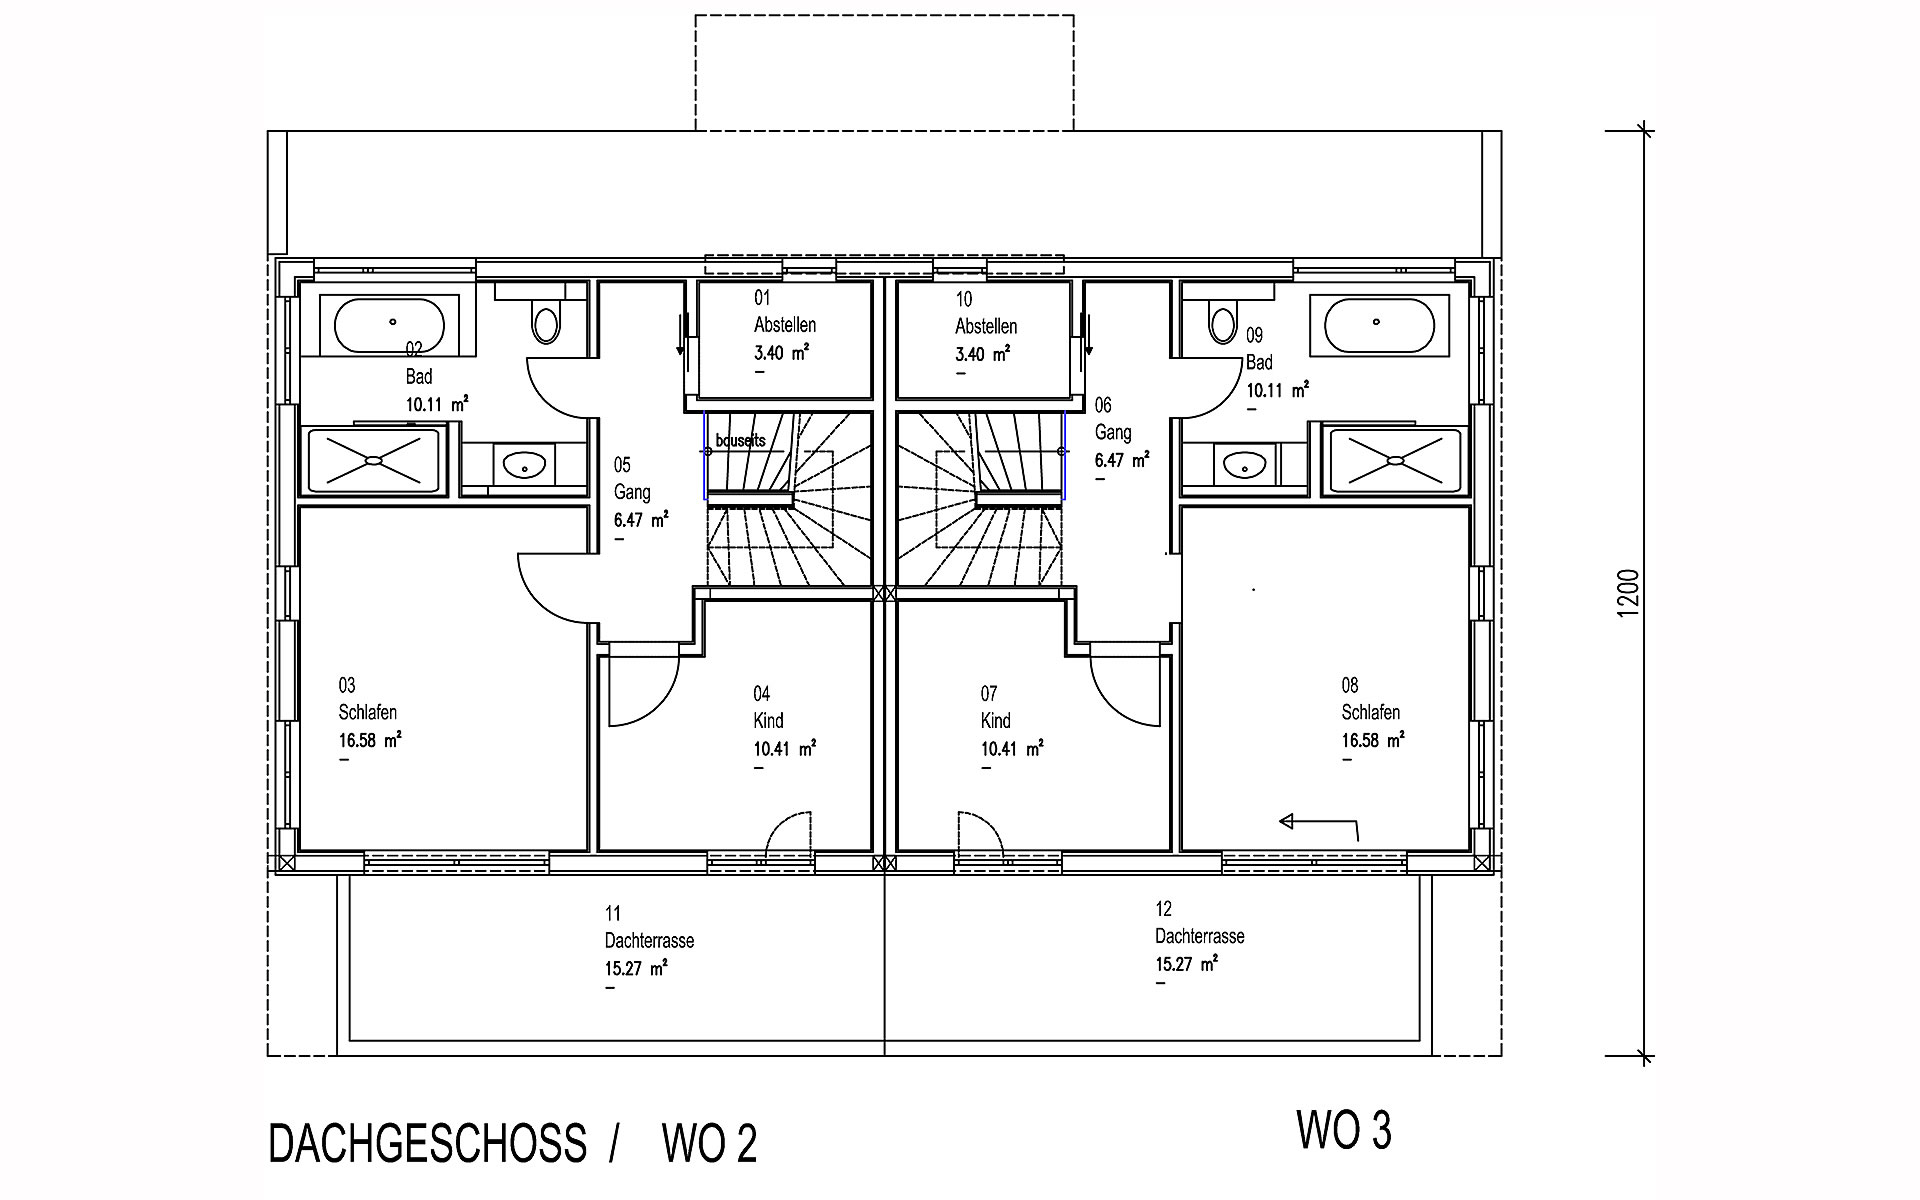 Dachgeschoss Brunnthal von Sonnleitner Holzbauwerke GmbH & Co. KG